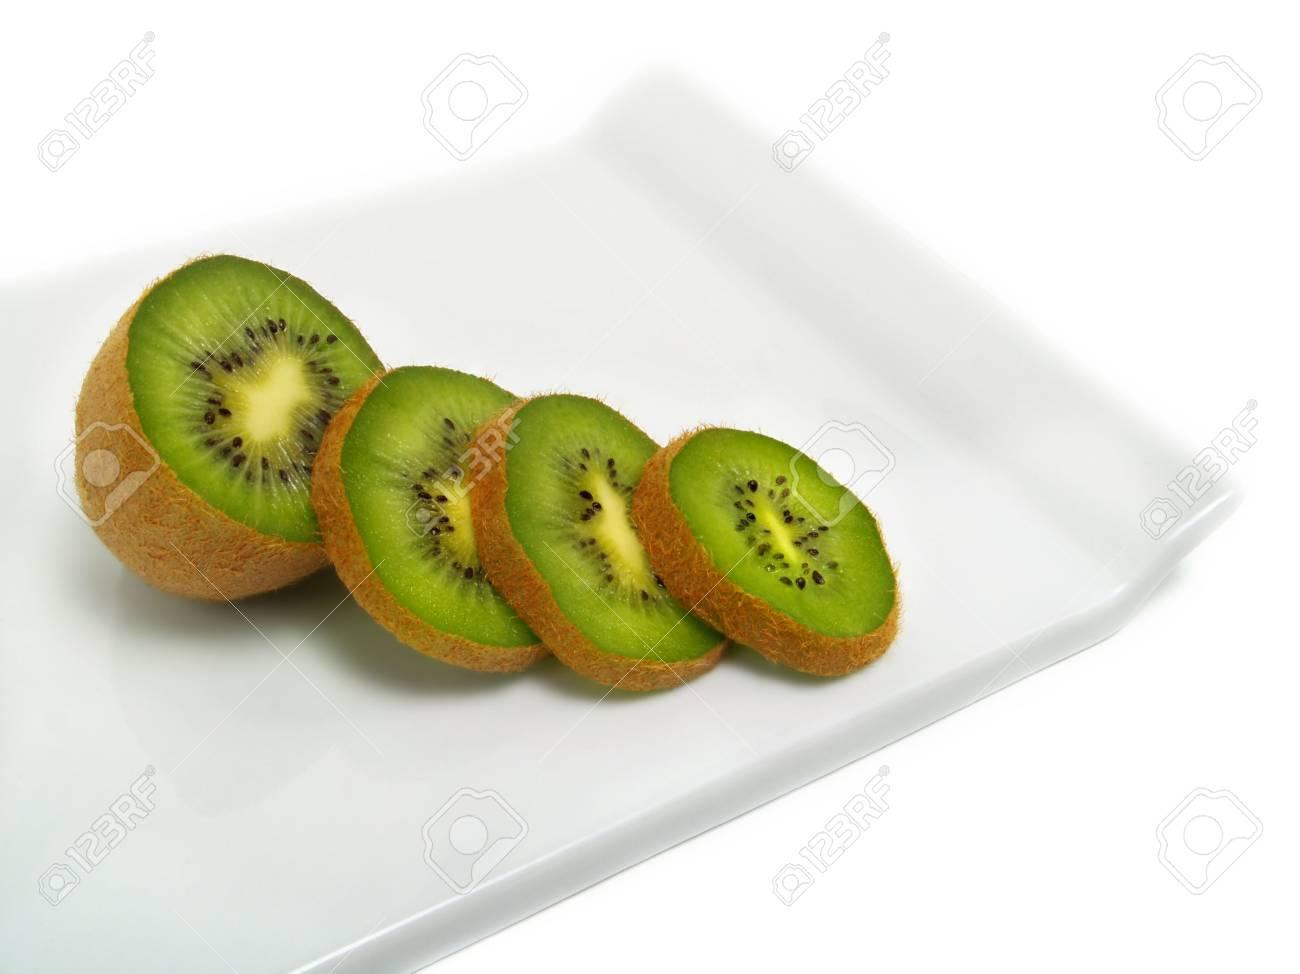 Sliced fresh ripe kiwi on cutting board and isolated on white background Stock Photo - 3251928